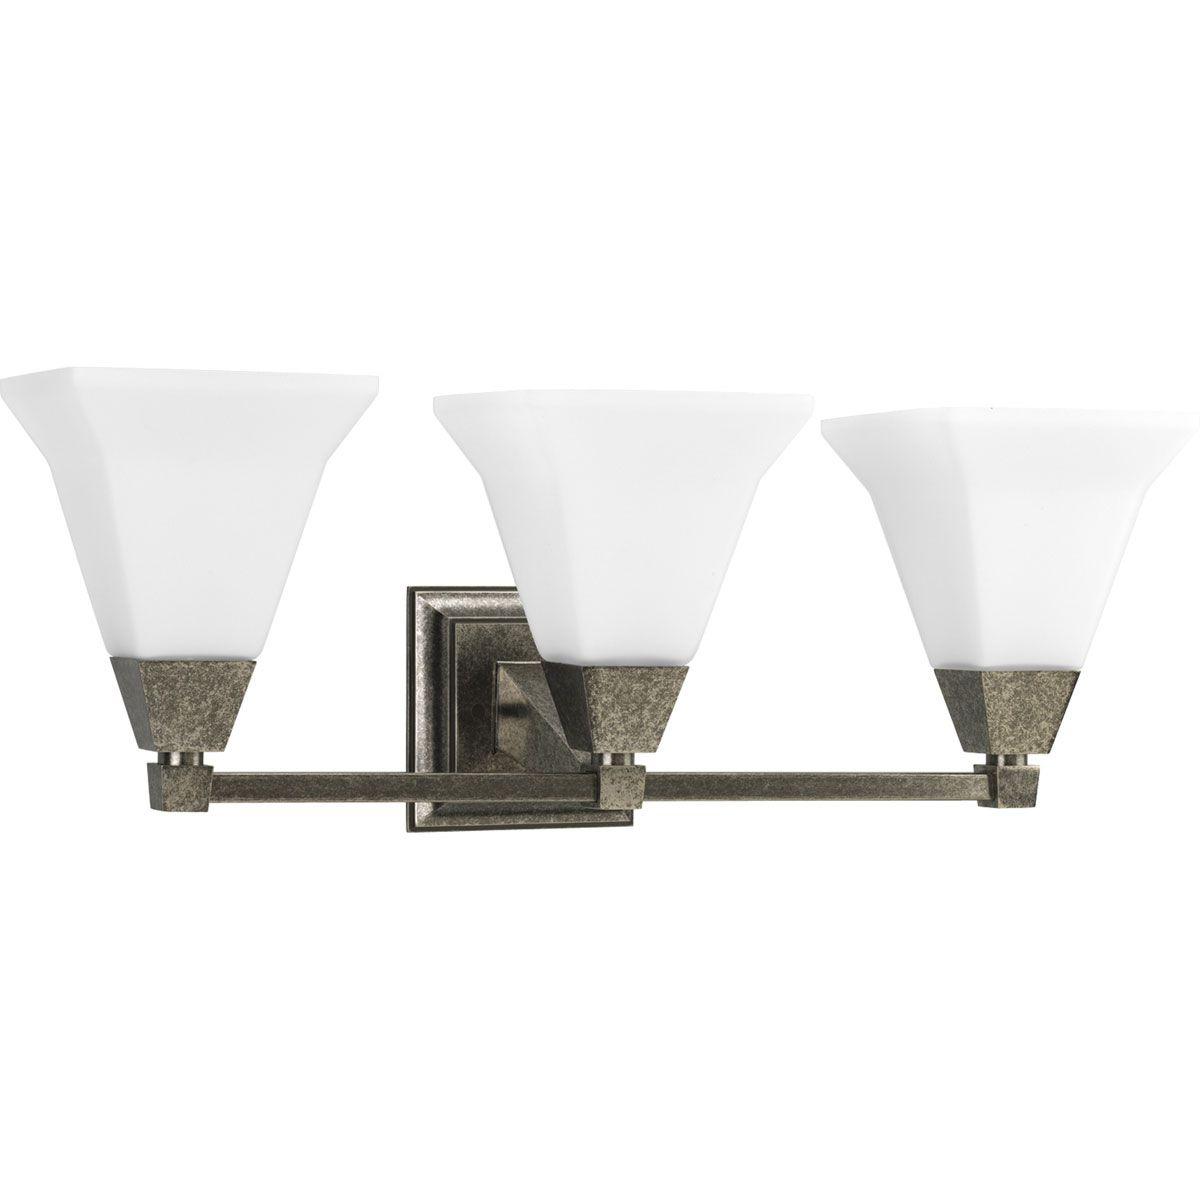 Lighting Matches Delta Dryden Design Bathroom